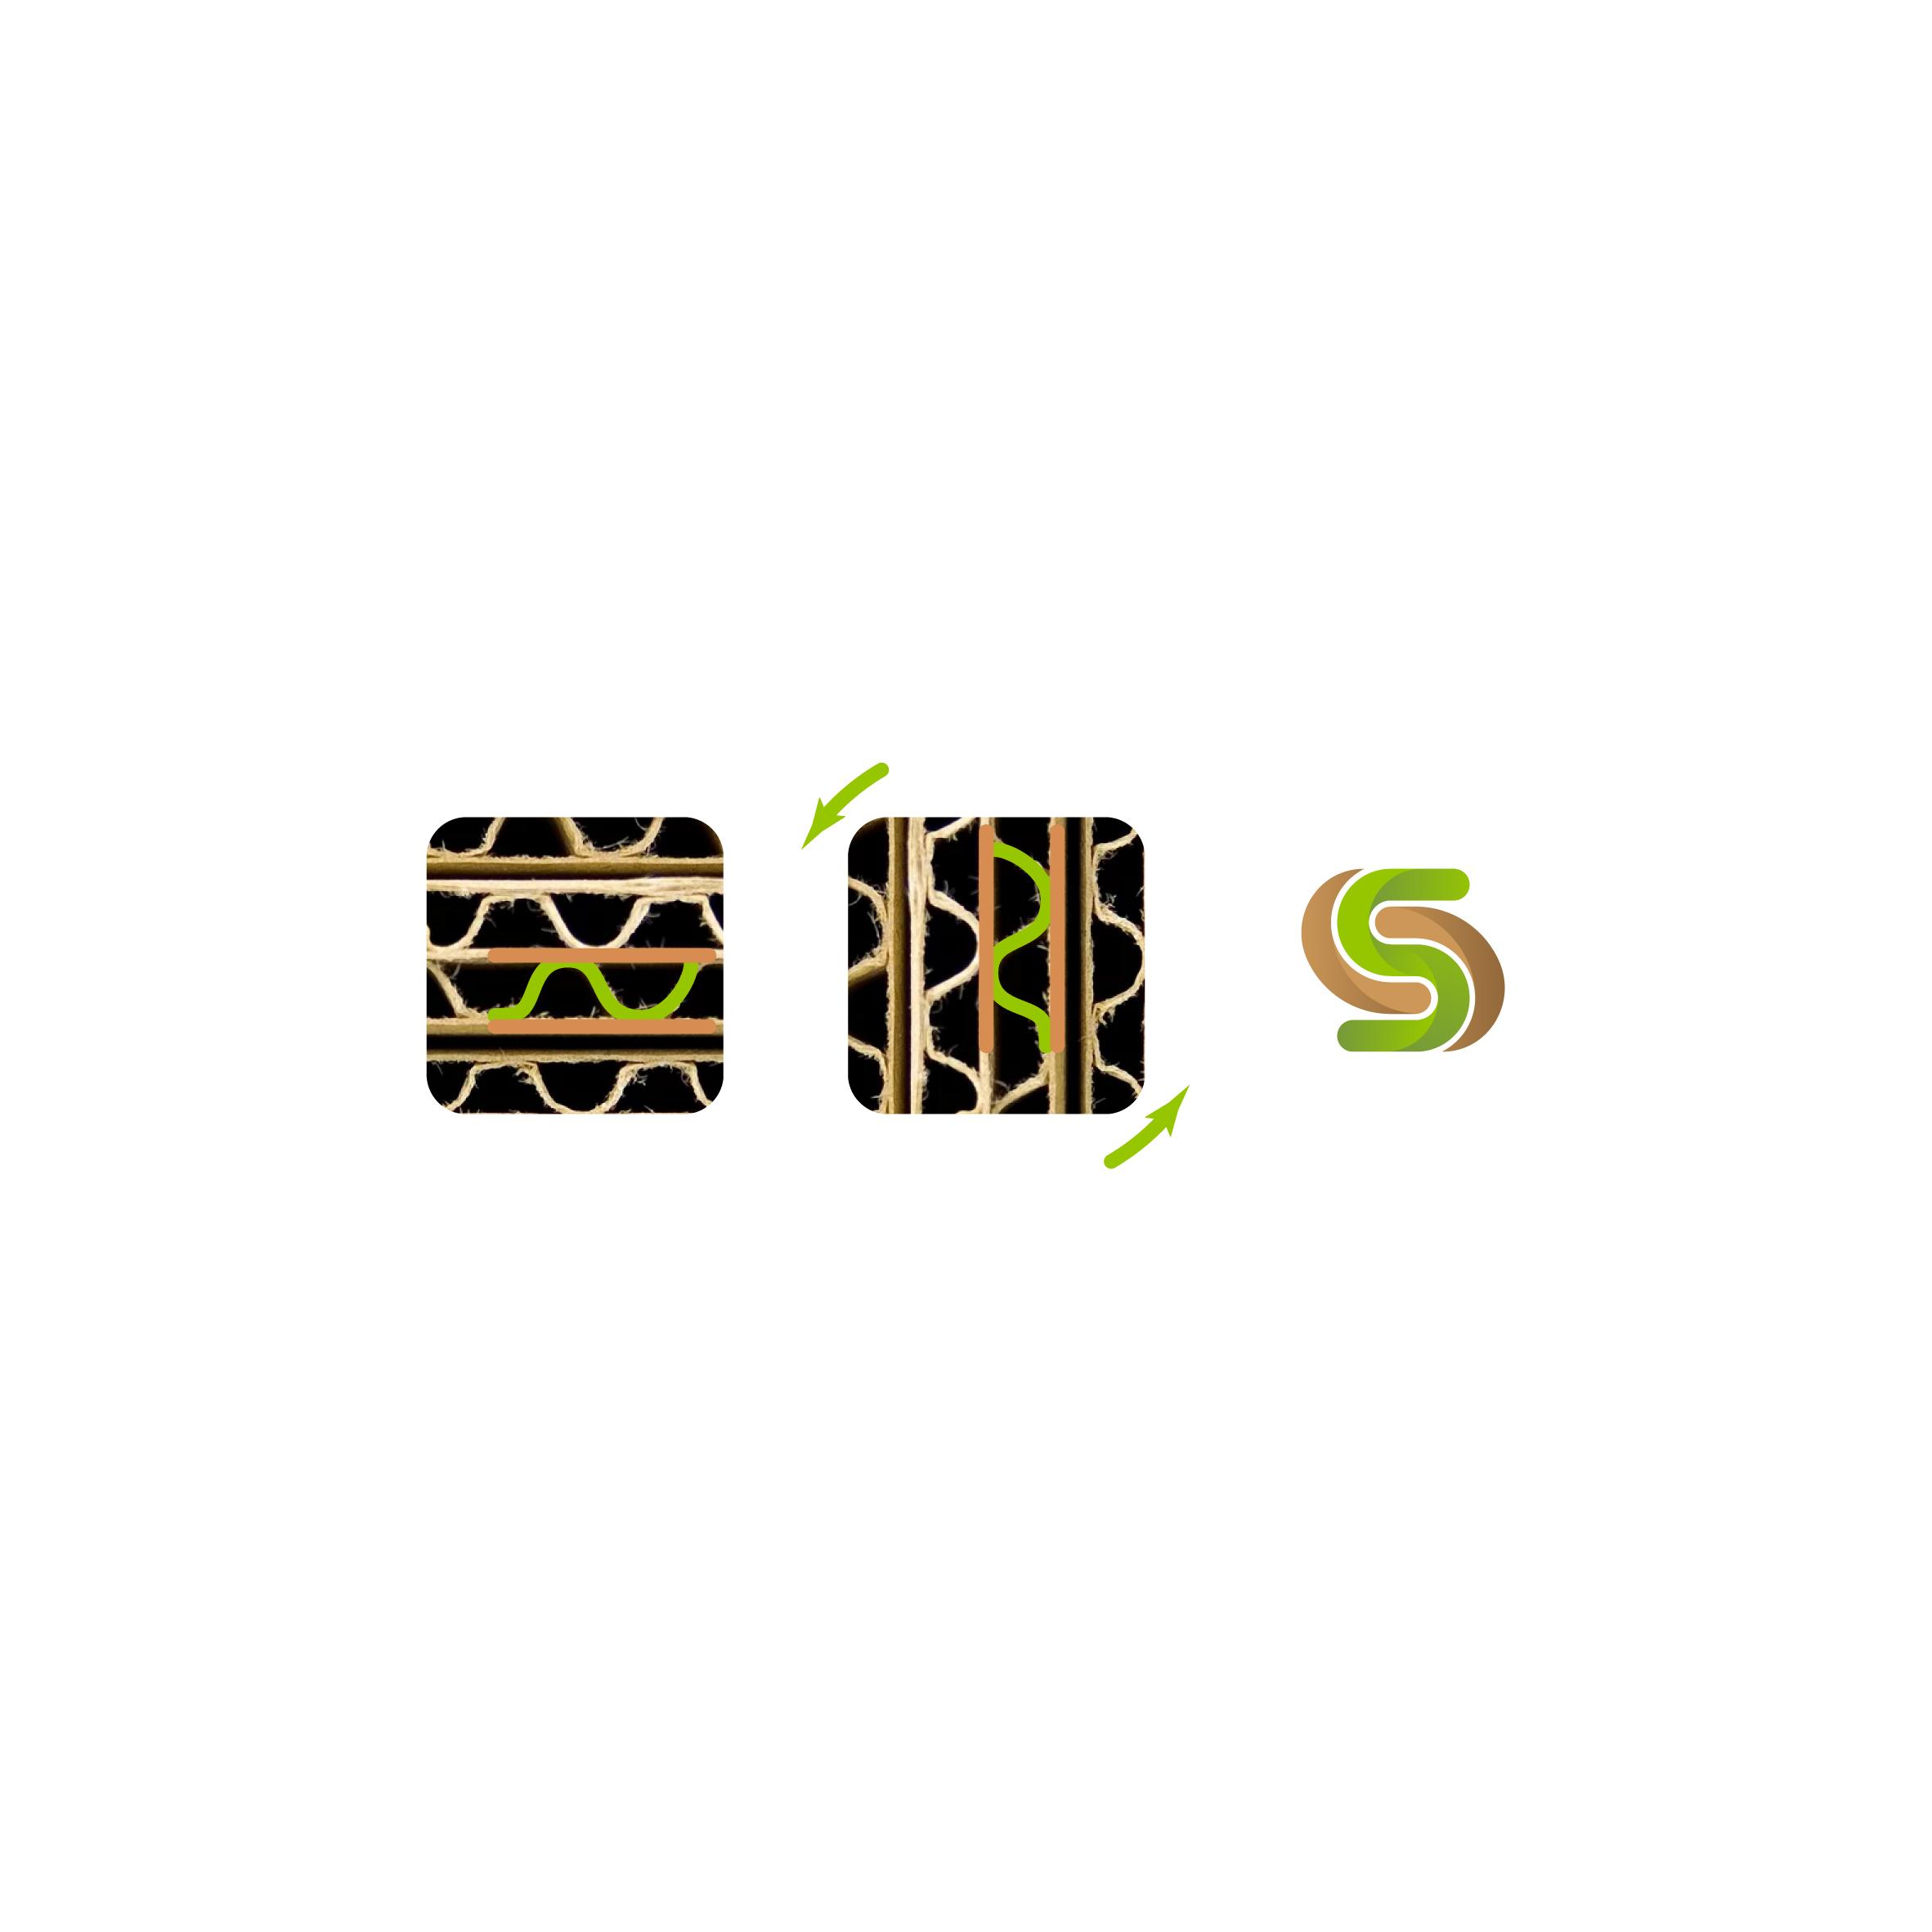 Логотип для компании по реализации упаковки из гофрокартона фото f_2795cde6767ce4ca.jpg